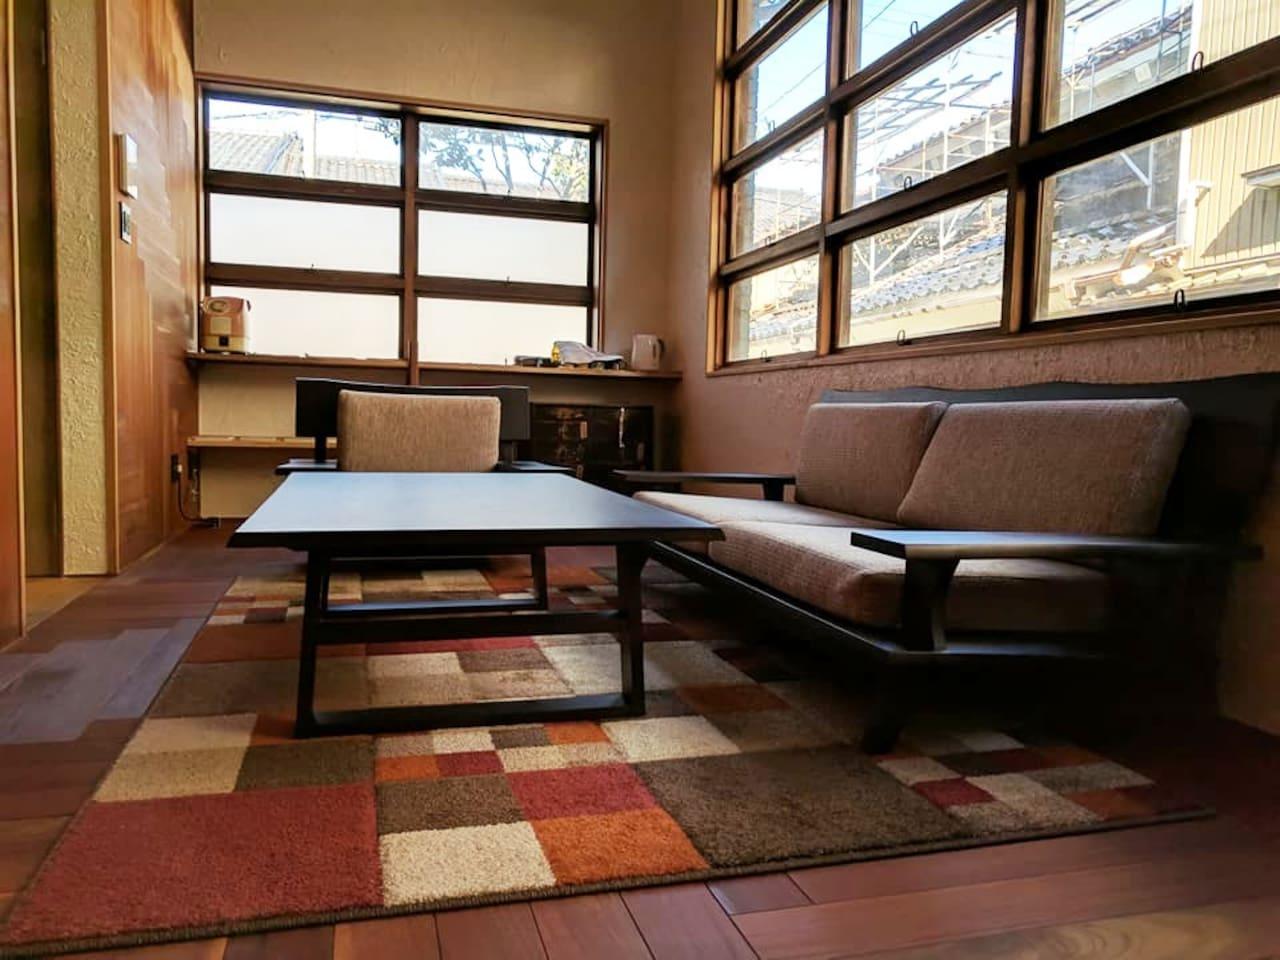 TSUBAKI HOUSE newly renovated house 一日一組限定貸切宿